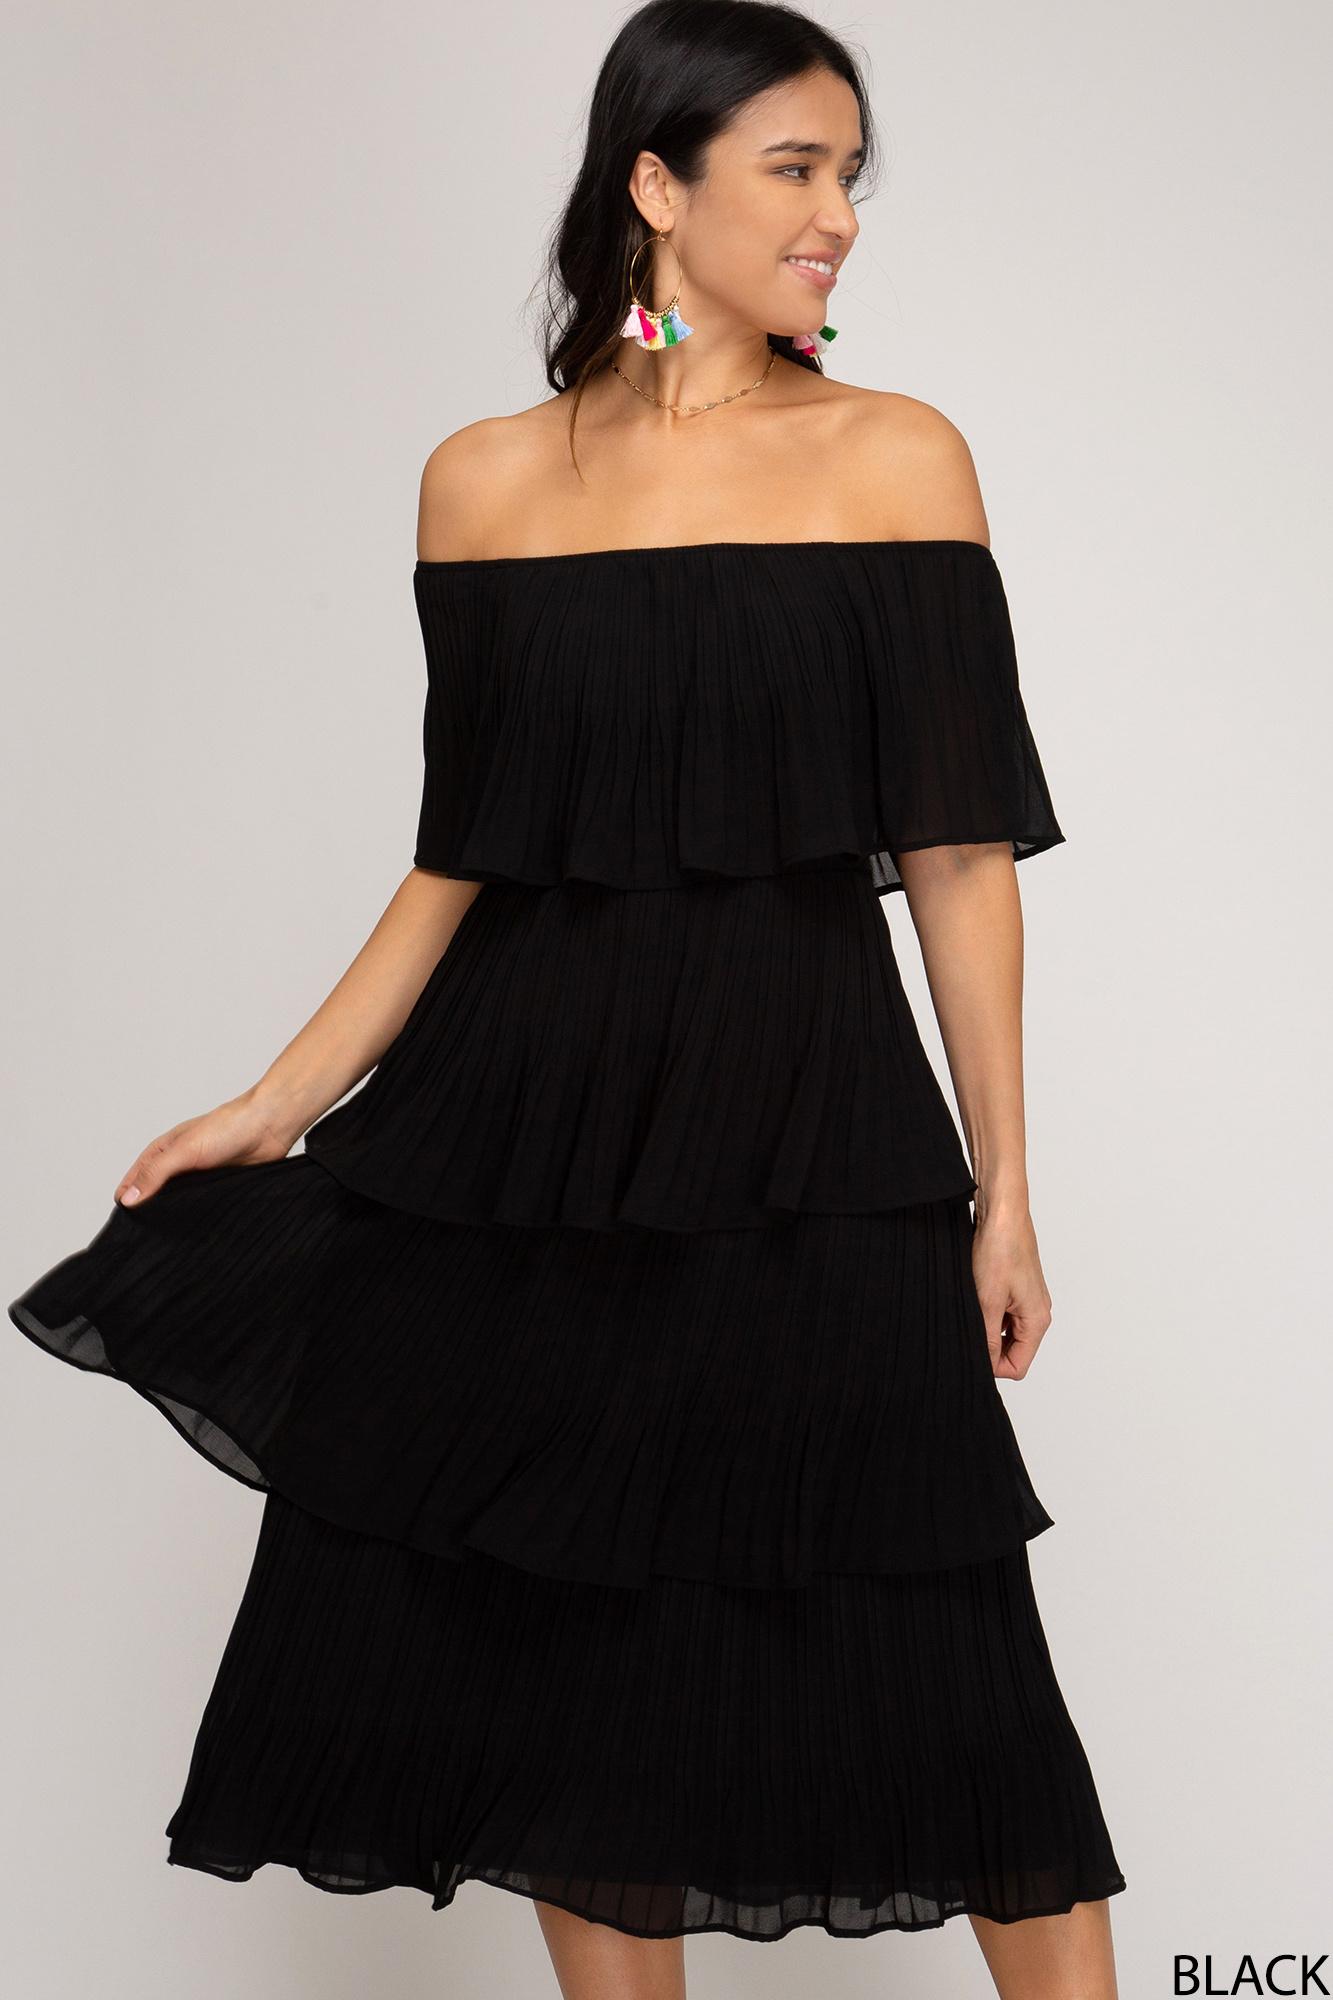 She & Sky Off Shoulder Midi Dress